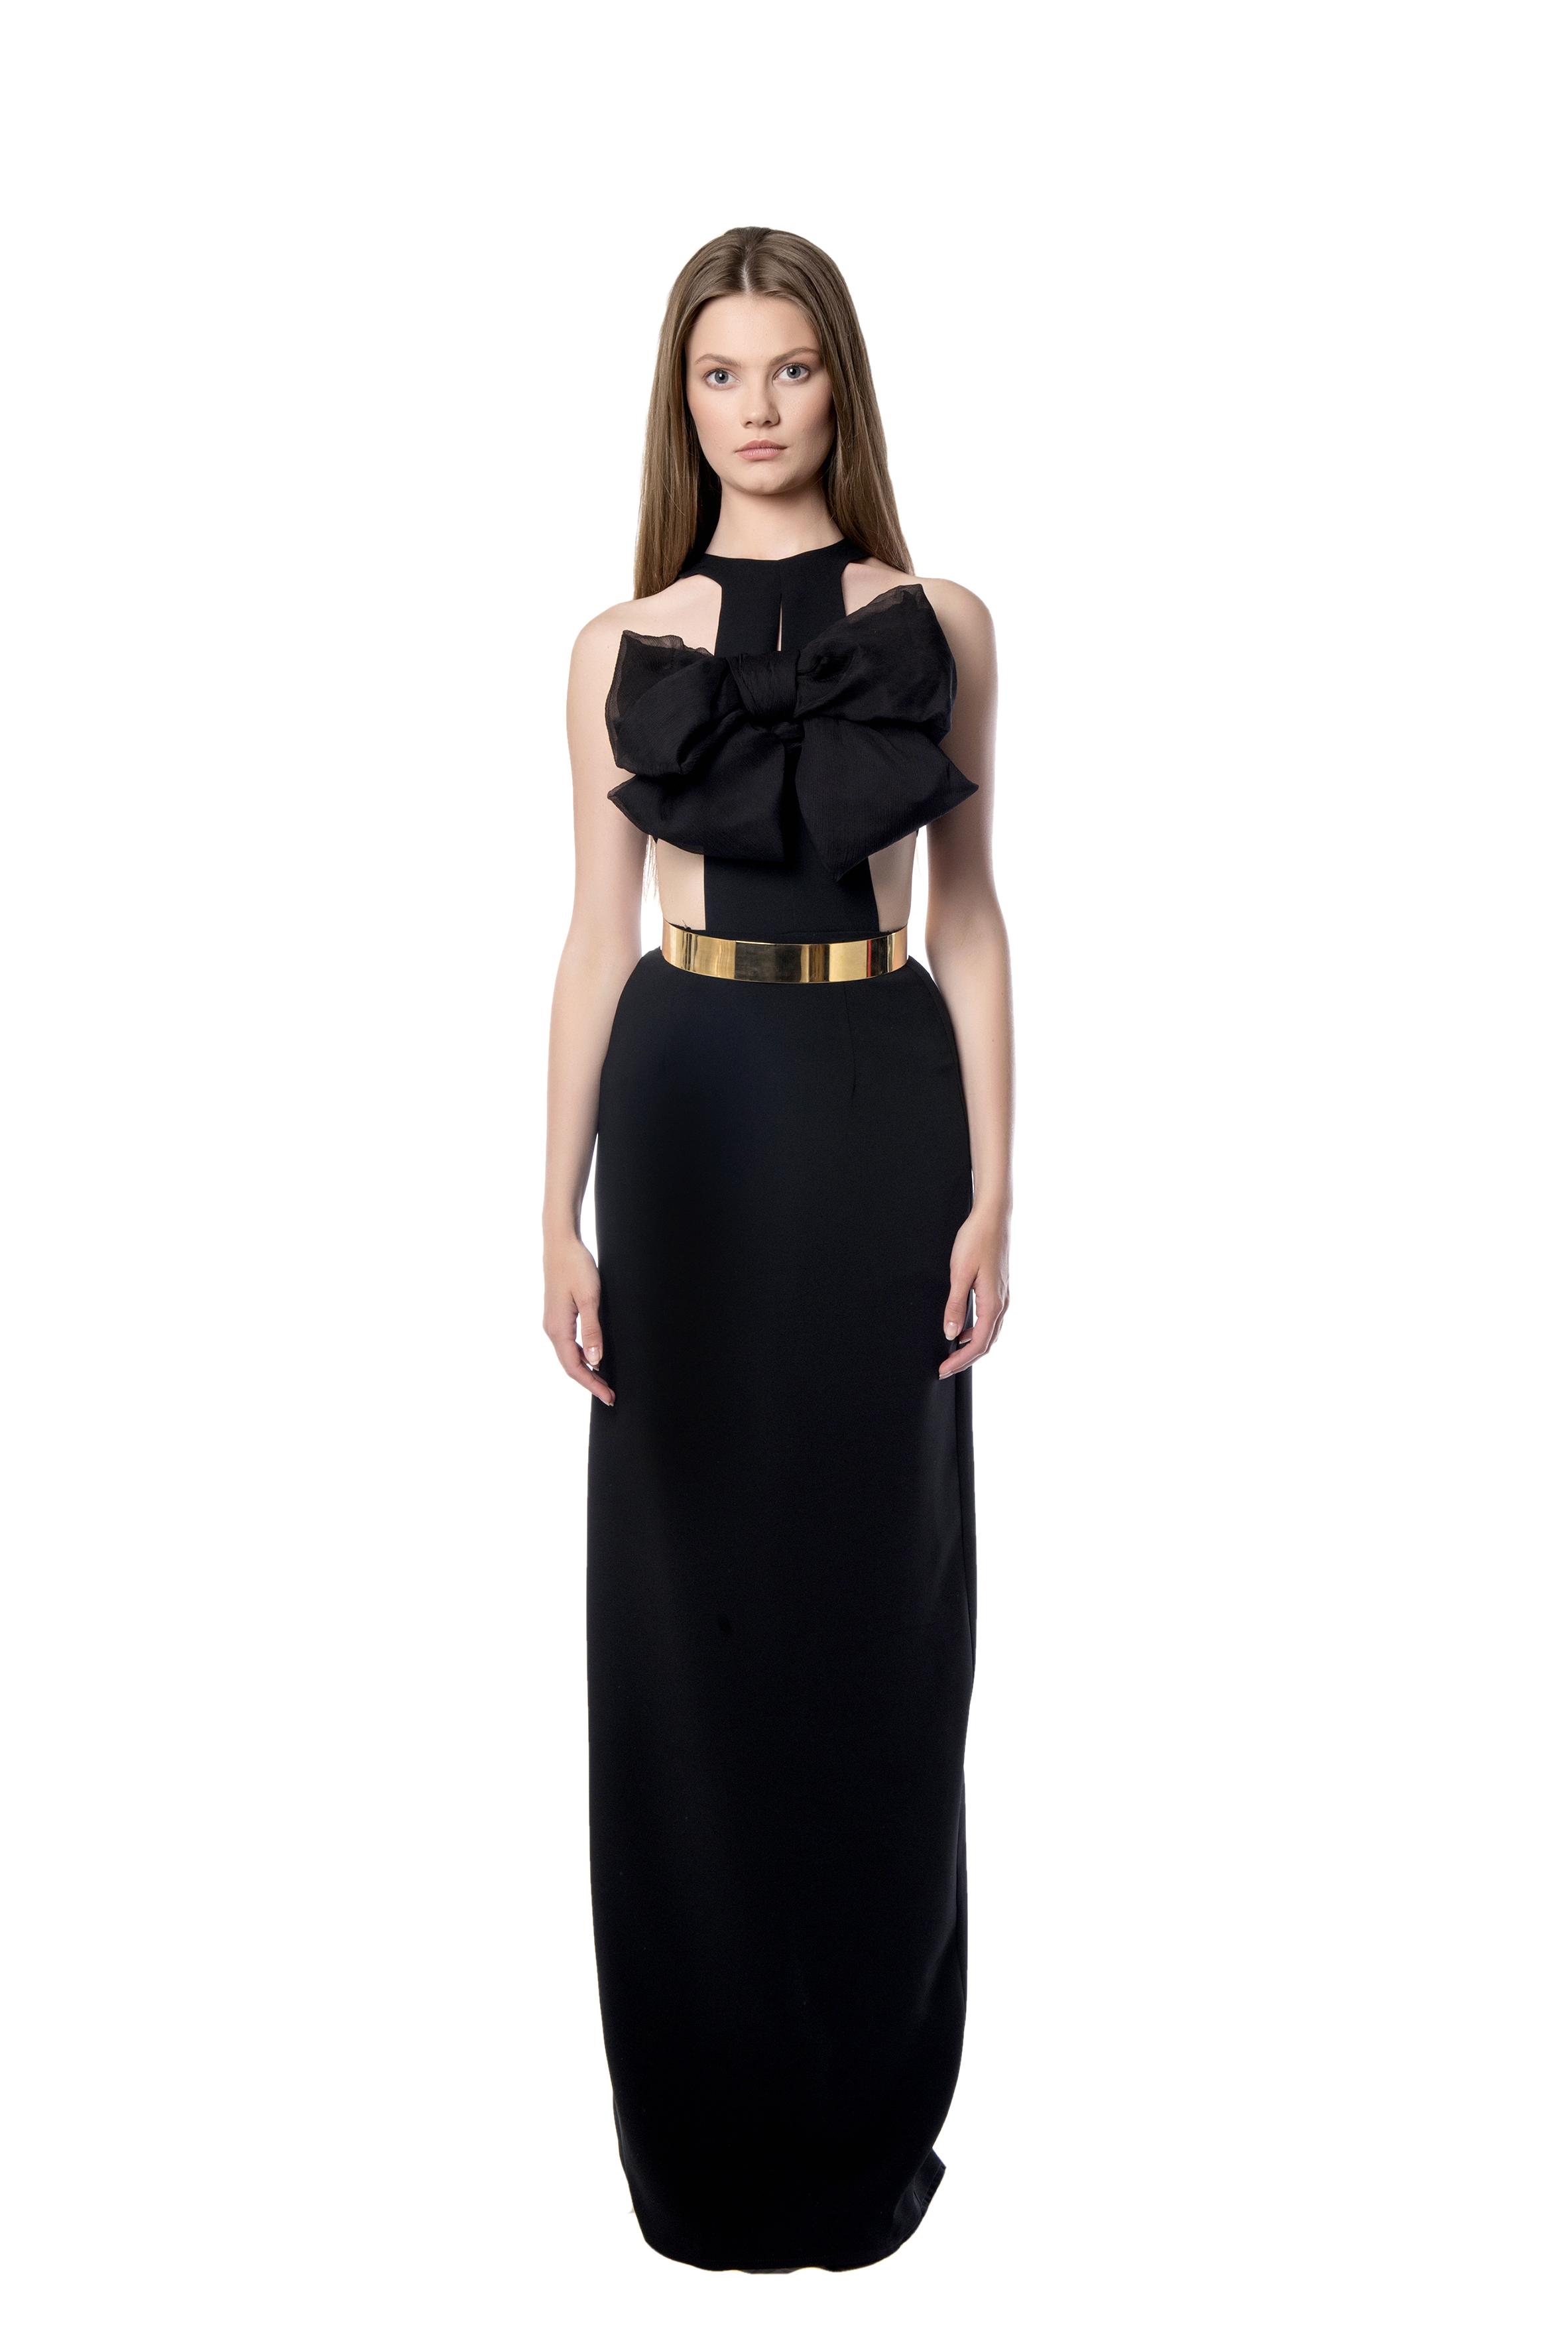 855c0d10e41c clothing   Μακρύ μαύρο φόρεμα με λεπτομέρεια φιόγκο. + · Προηγούμενο Προϊόν